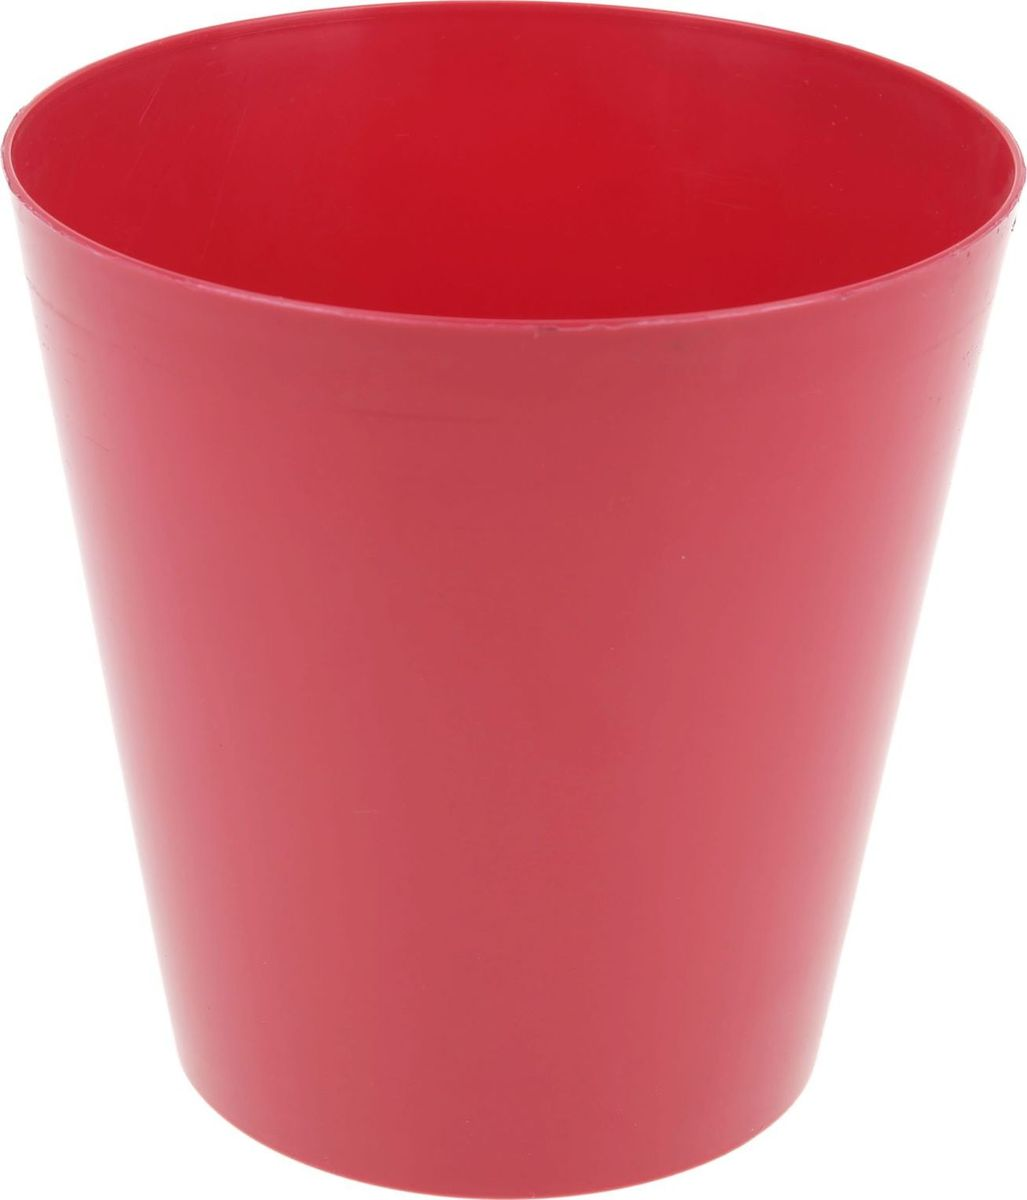 Кашпо Form plastic